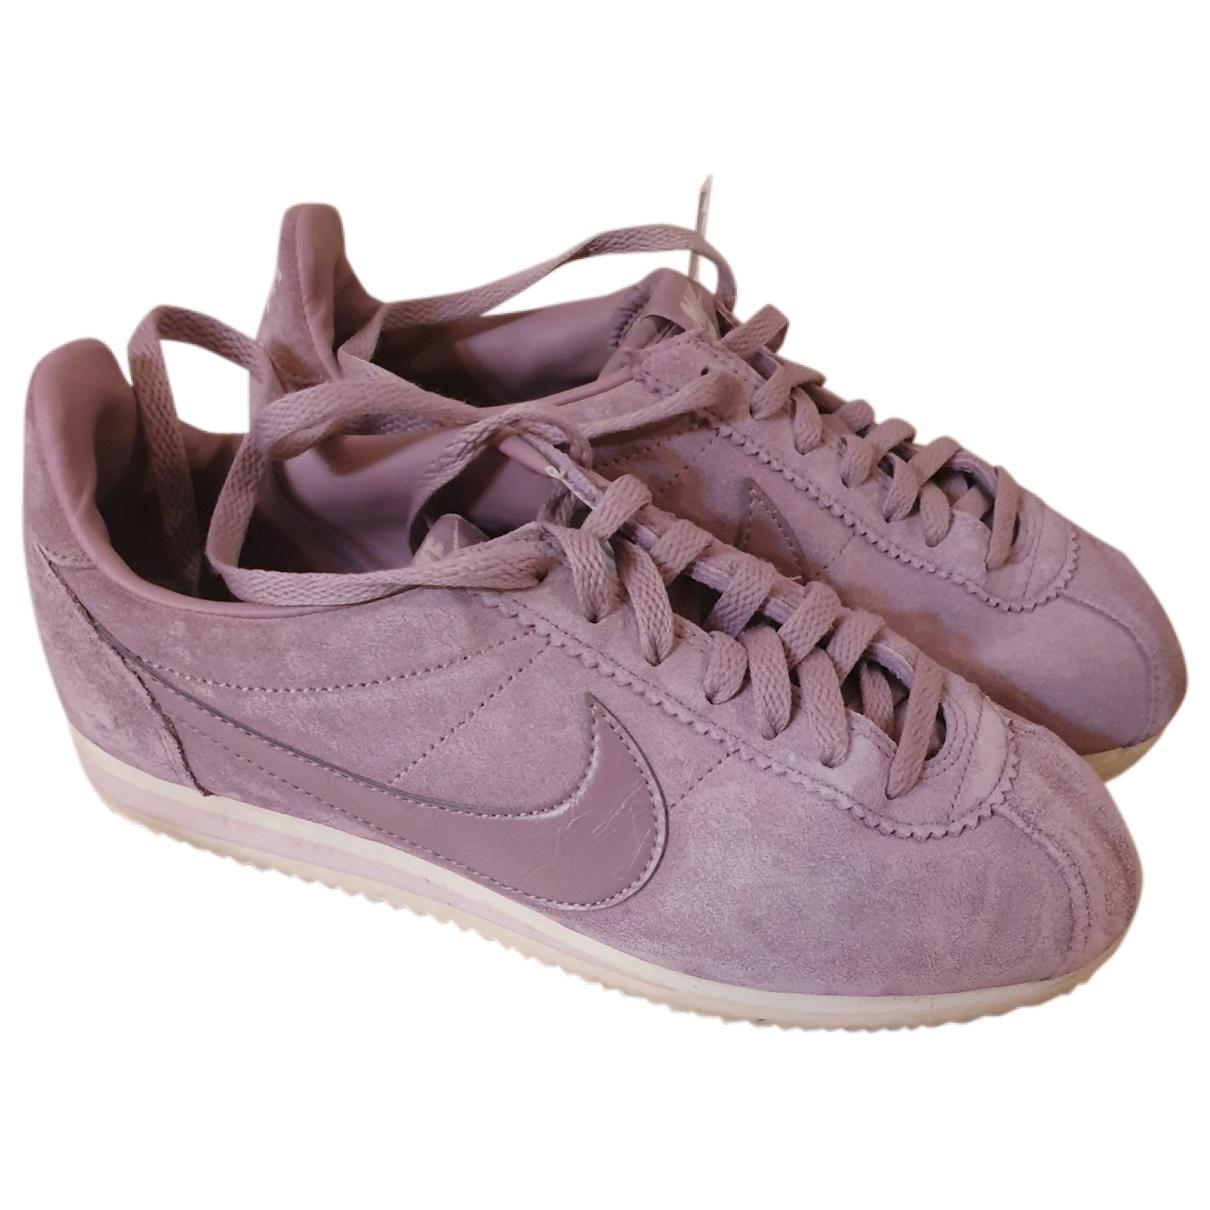 Nike Cortez Sneakers in Samt